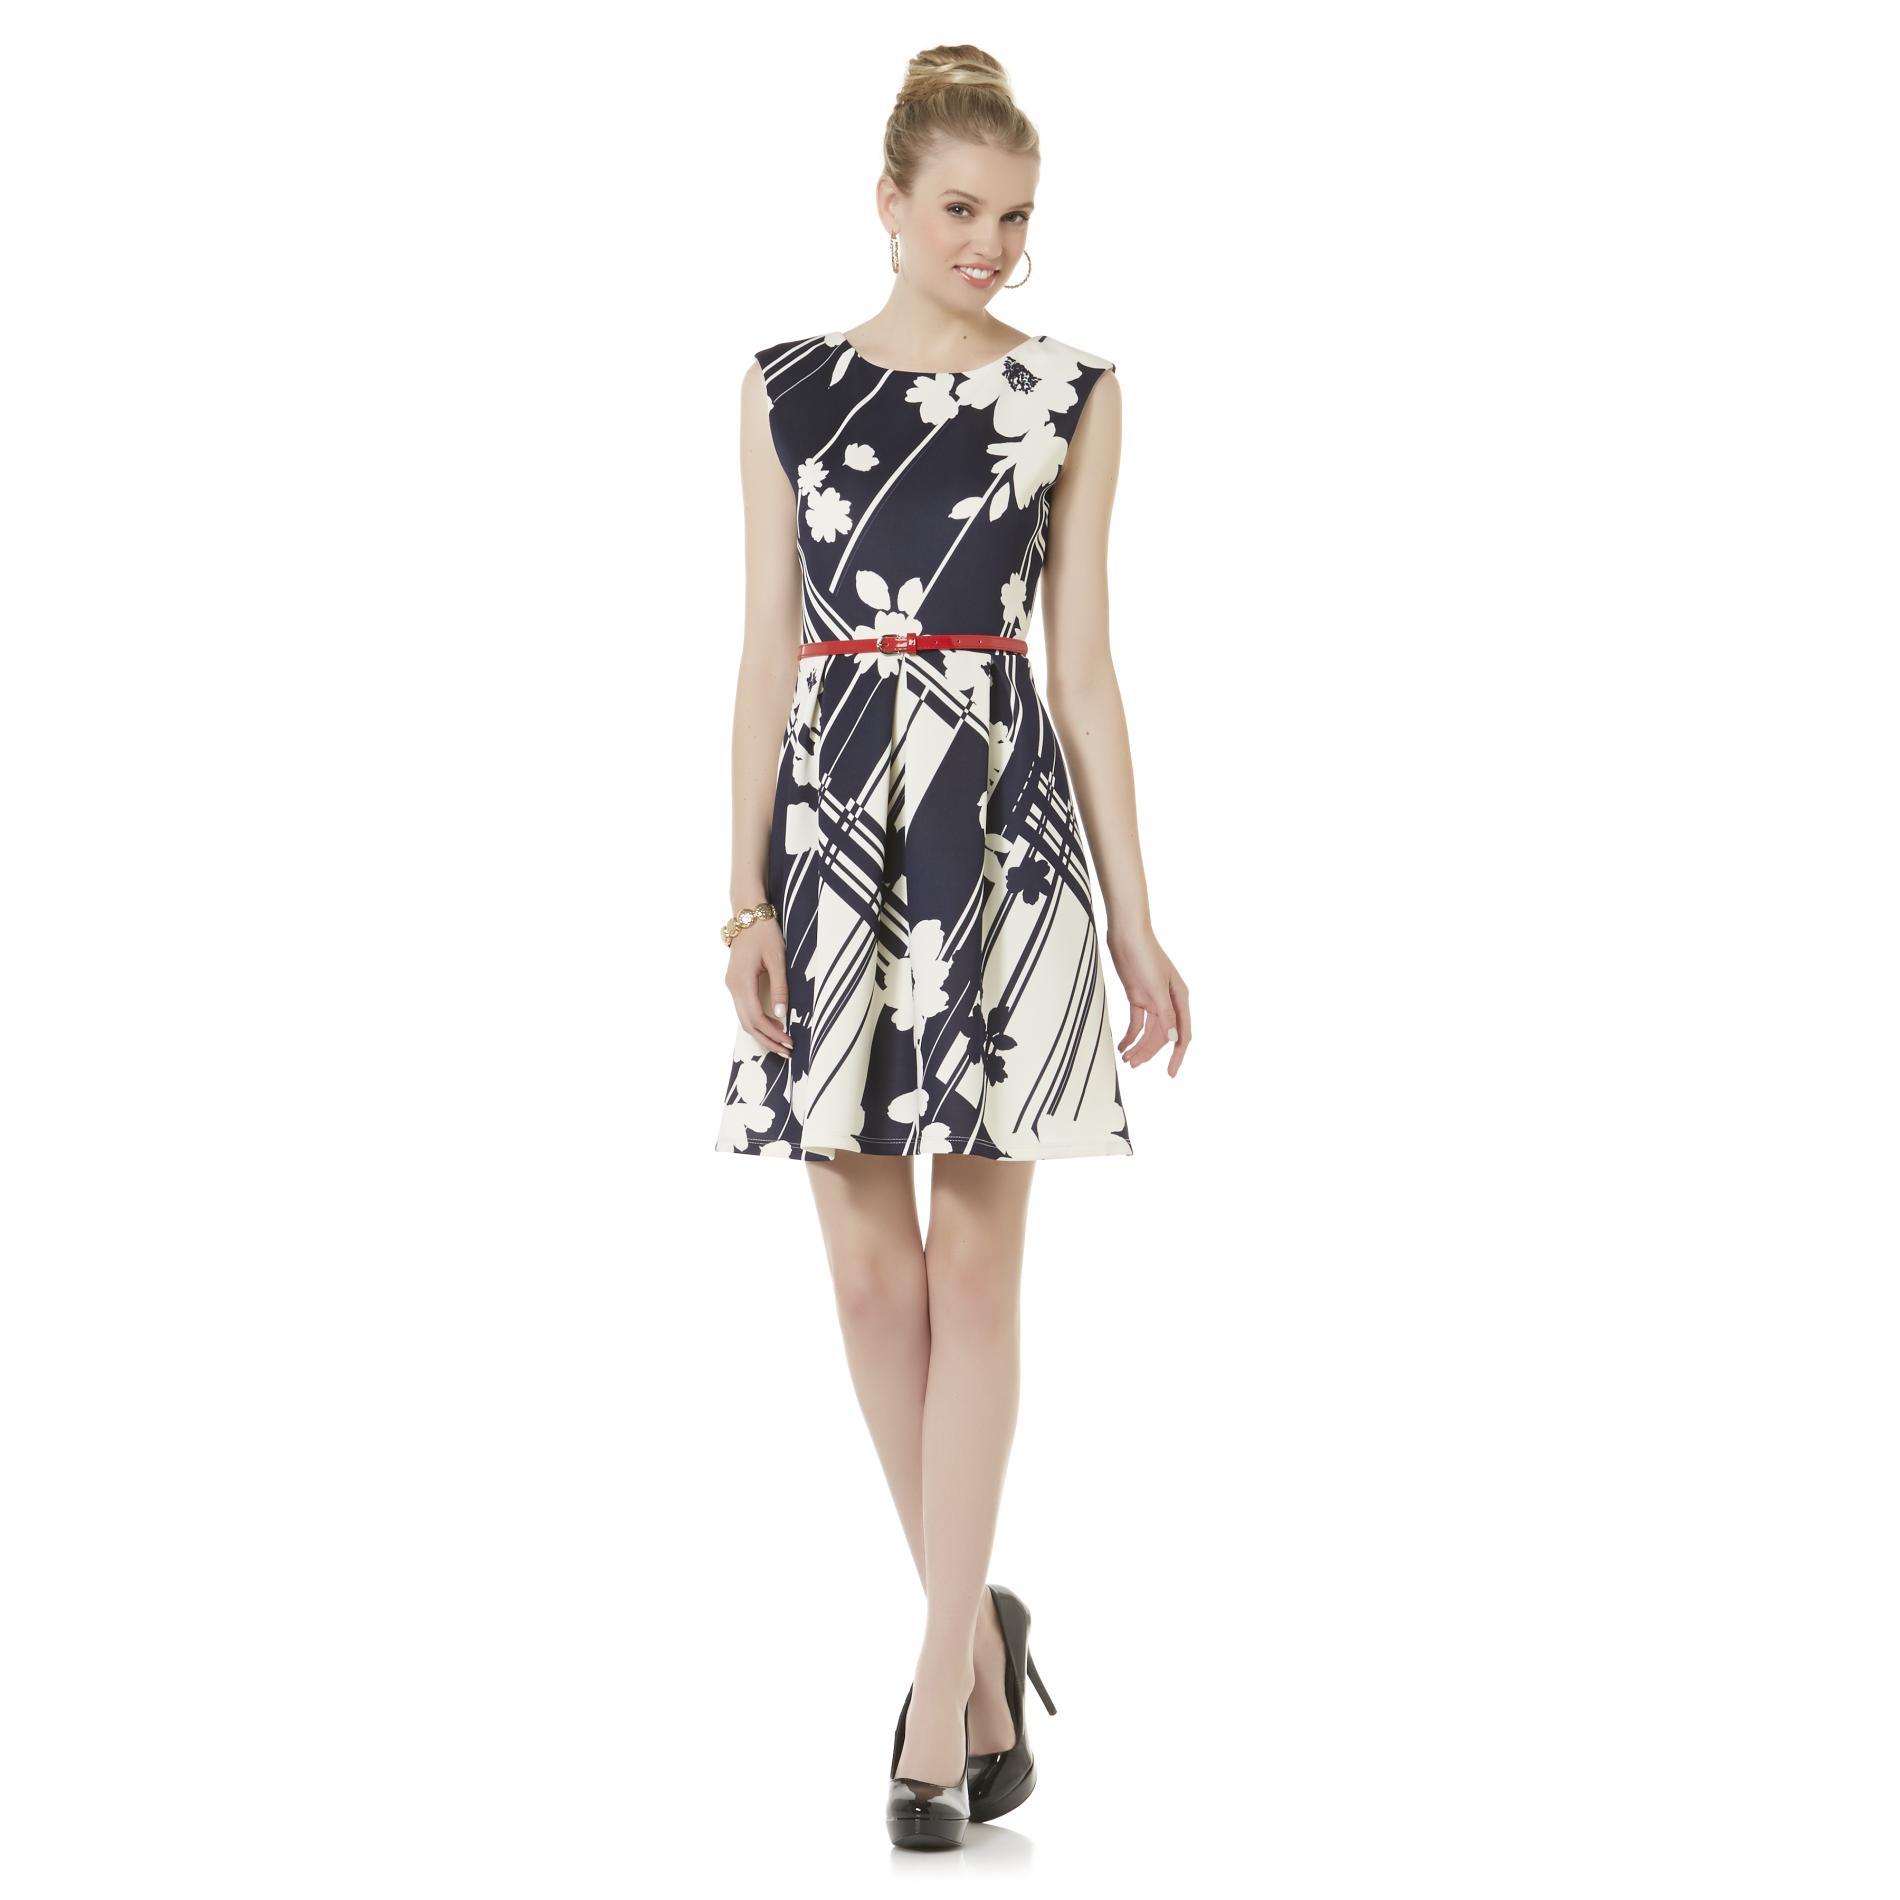 Covington Women's Sleeveless Dress & Belt - Floral Print